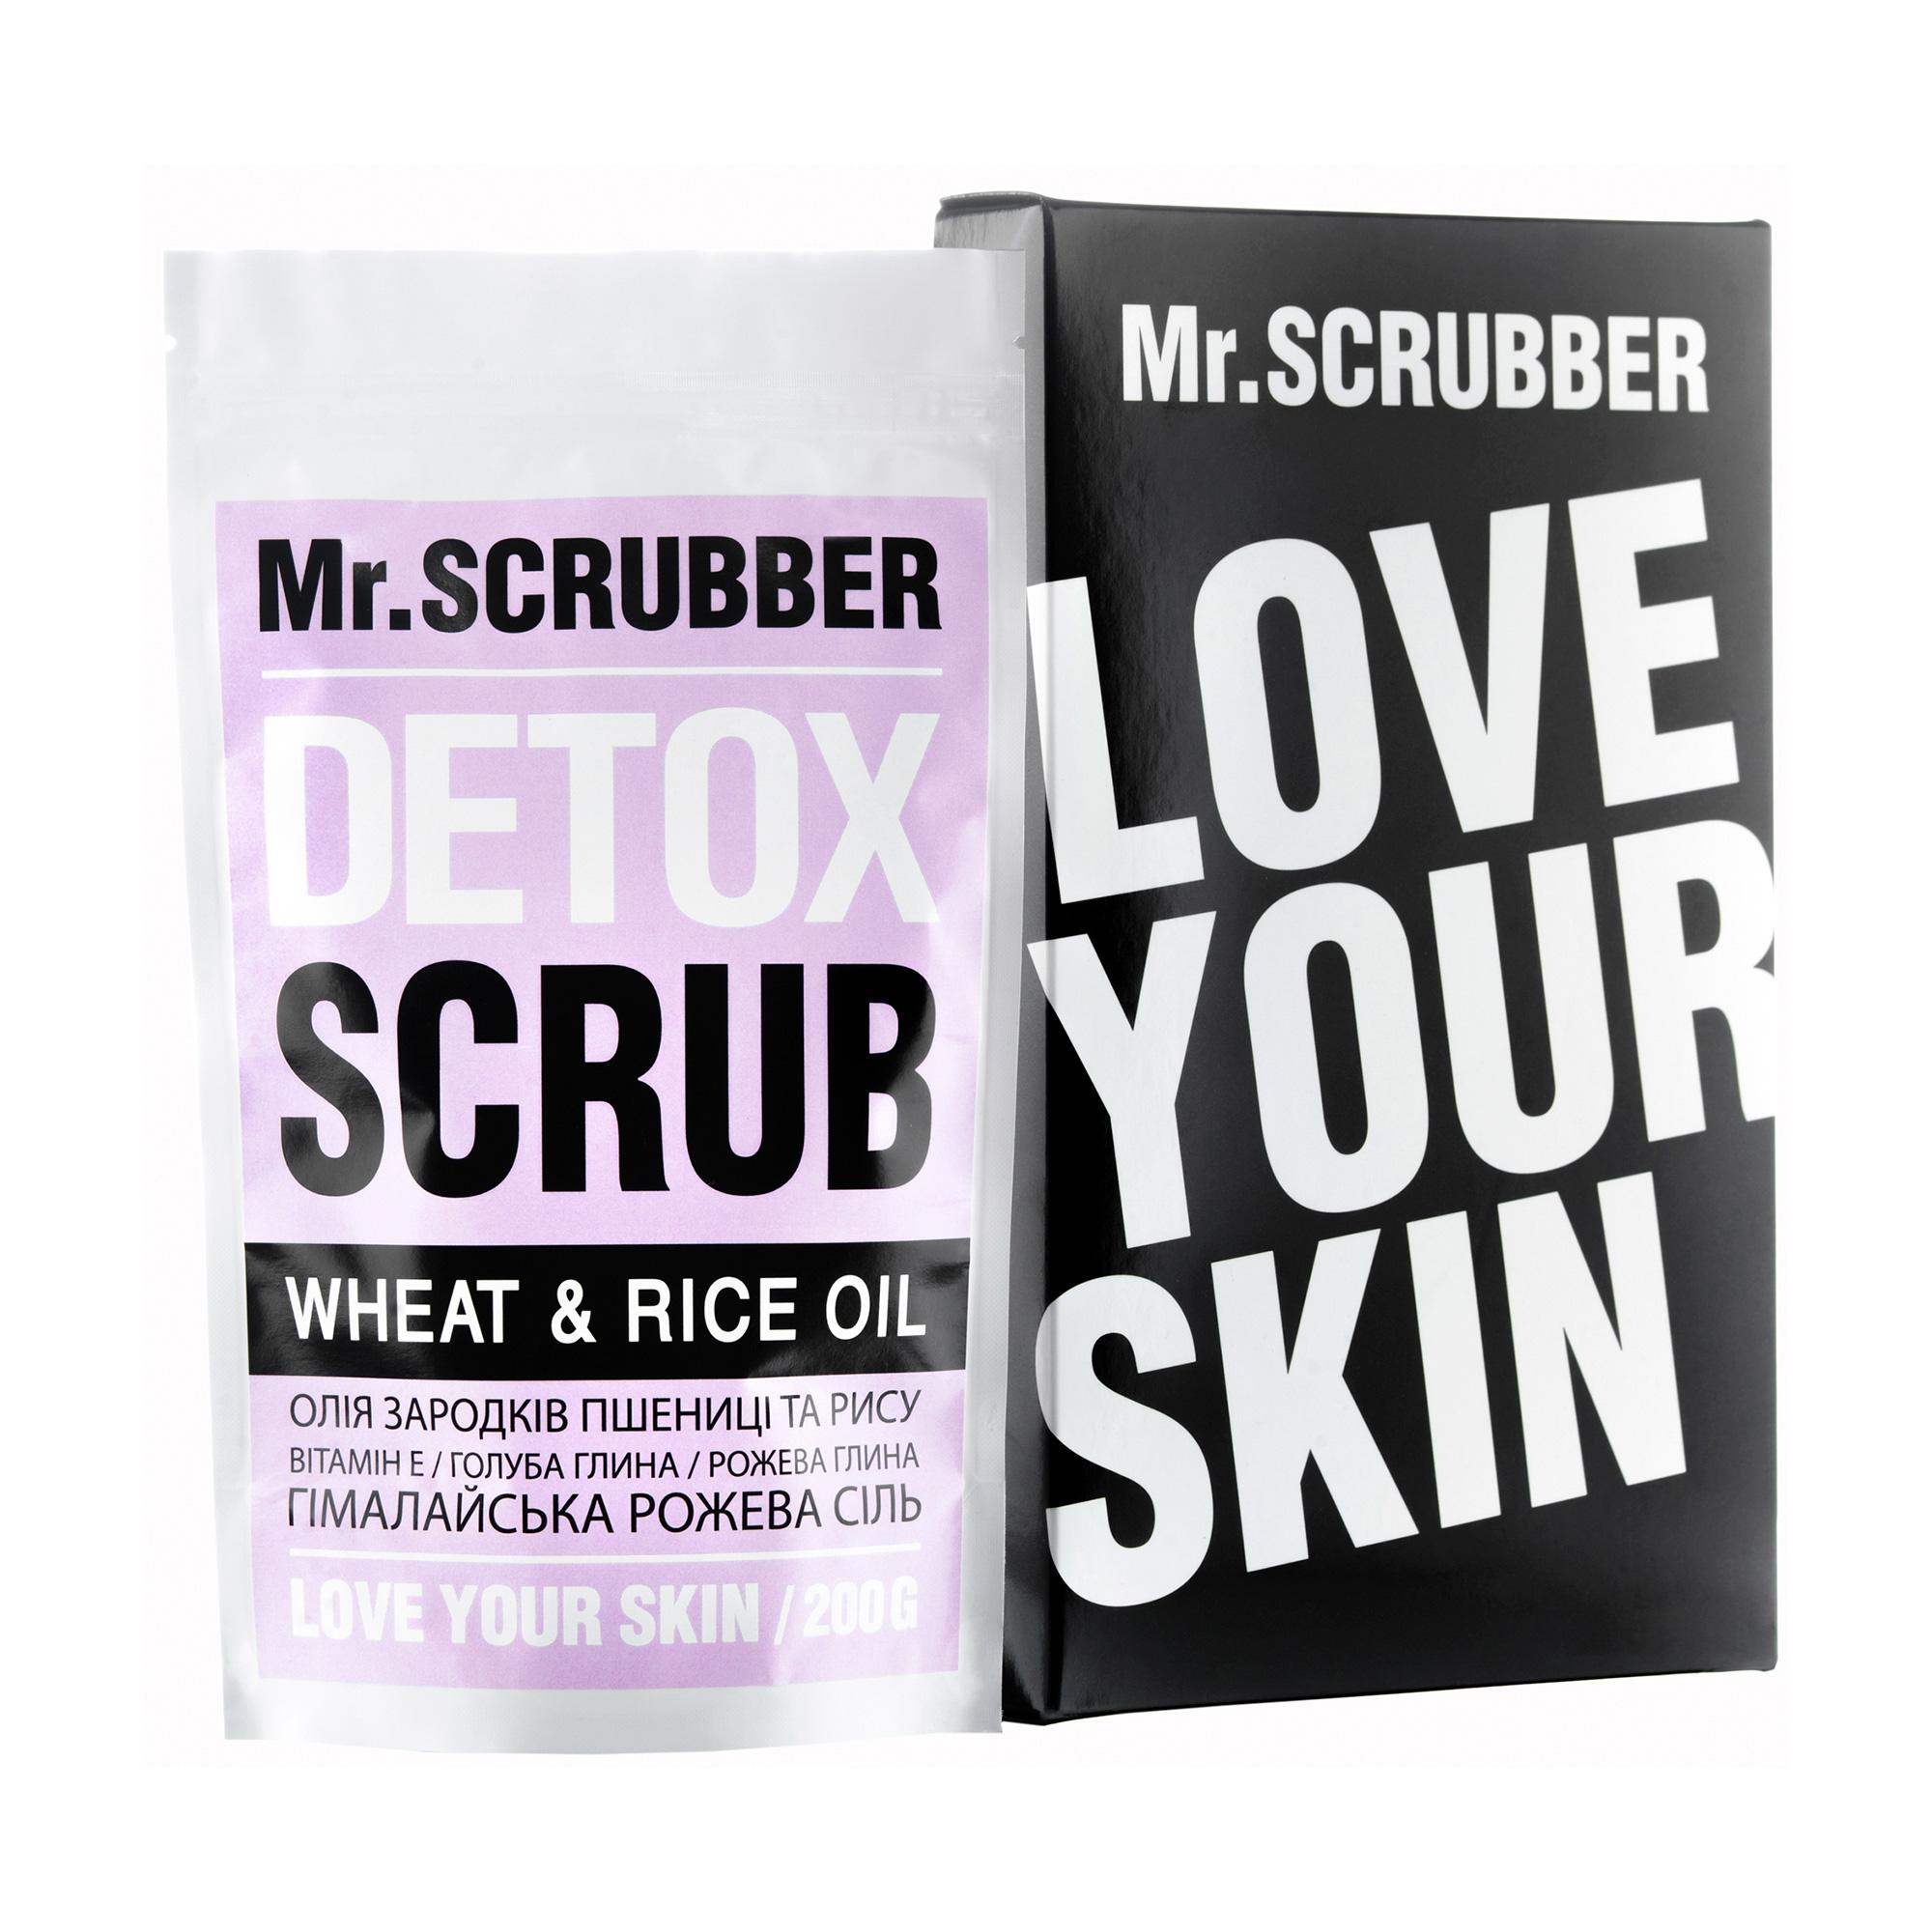 Рисовый скраб для тела Mr.Scrubber Detox Wheat and Rice Oil Детокс для похудения, 200 г